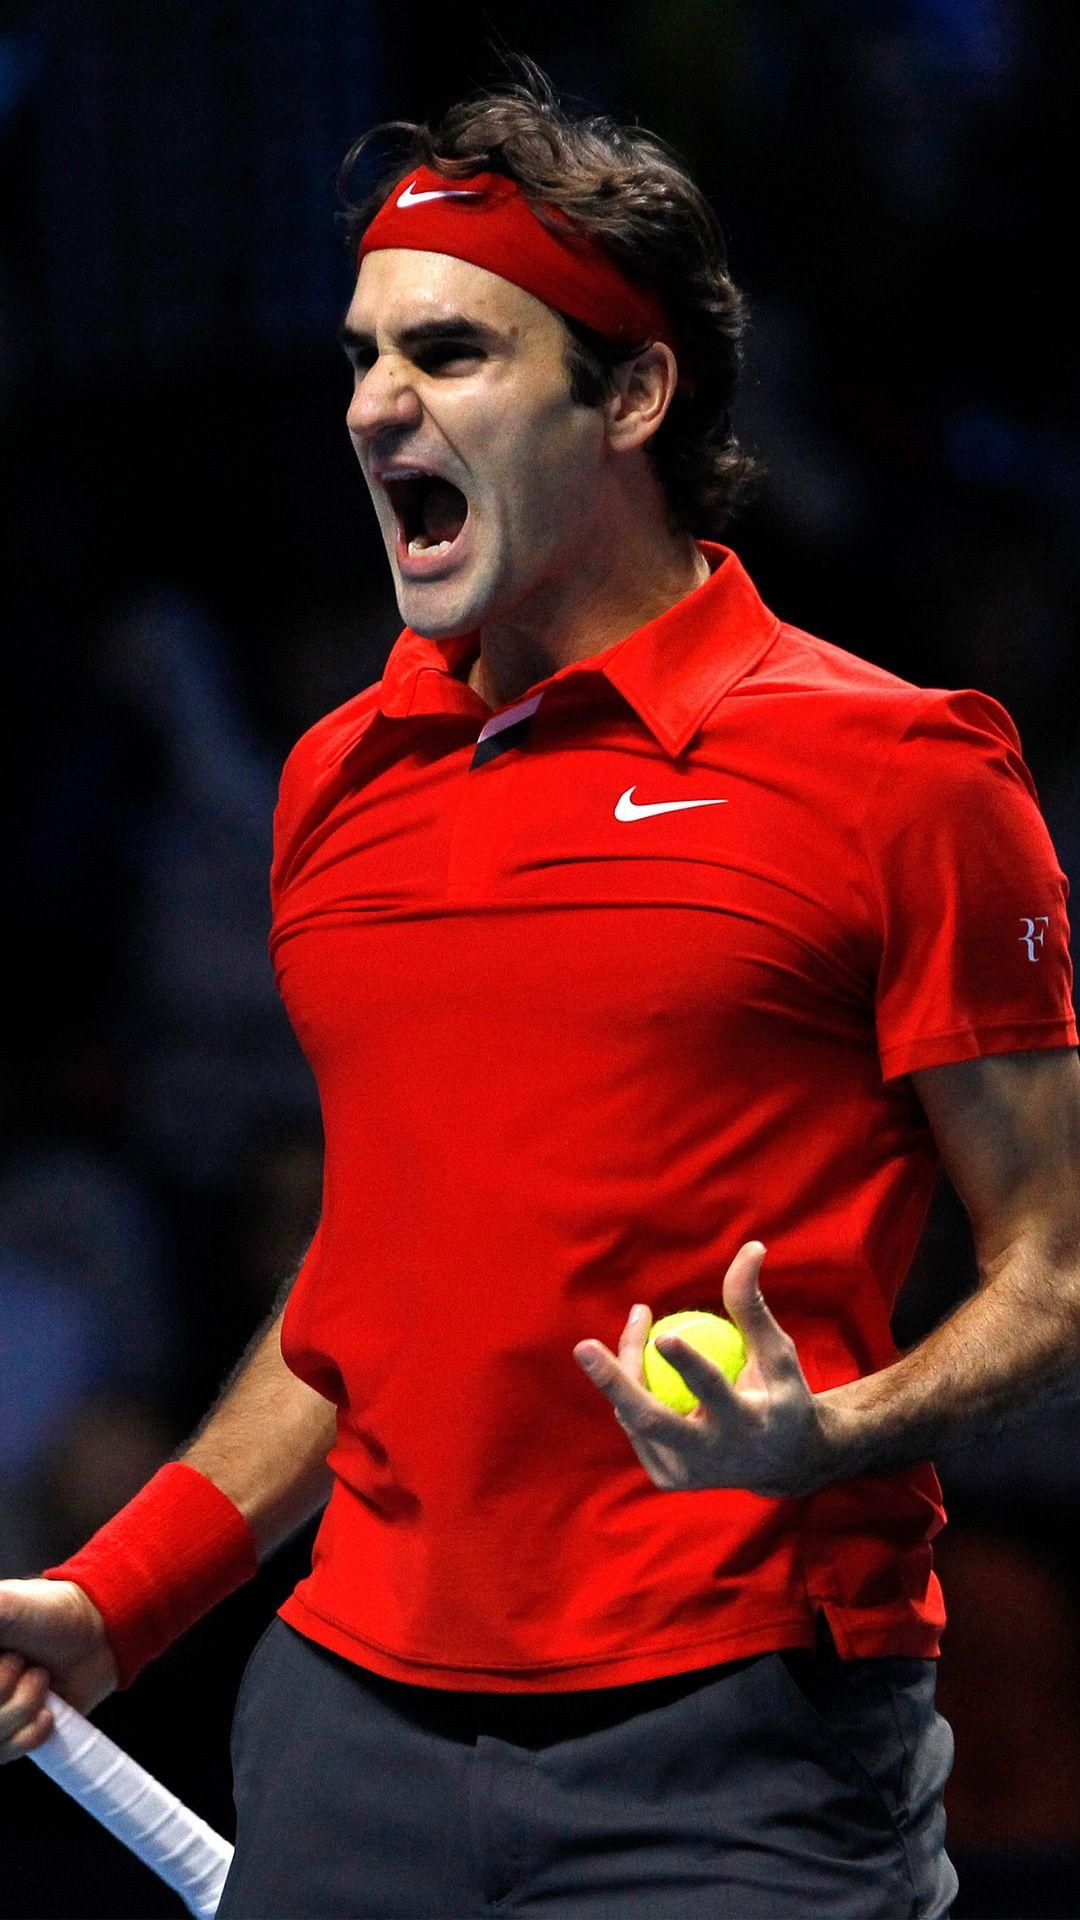 Roger Federer Wallpapers In Jpg Format For Free Download Roger Federer Tennis Tournaments Tennis